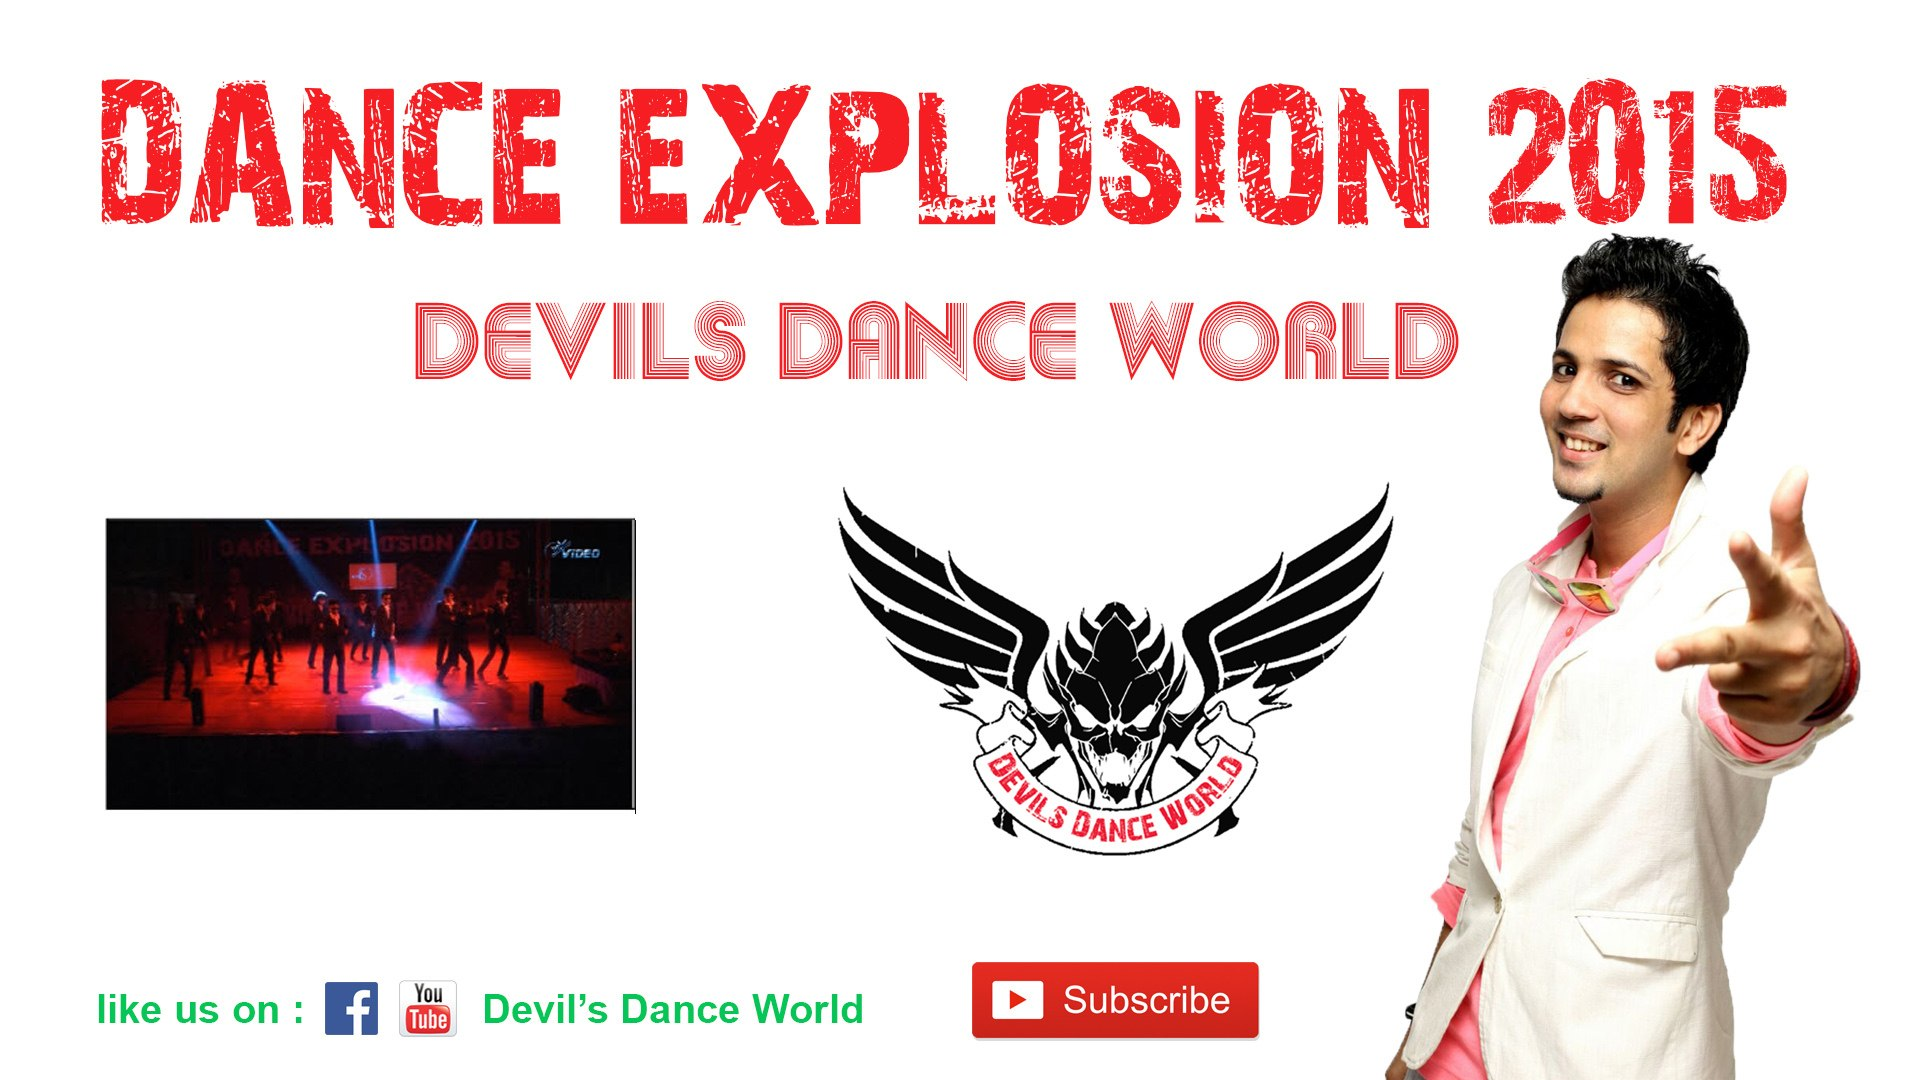 Hip Hop Dance Videos | Amazing Dance by Ranjit Sir | Dance Explosion 2015 | Devil's Dance World